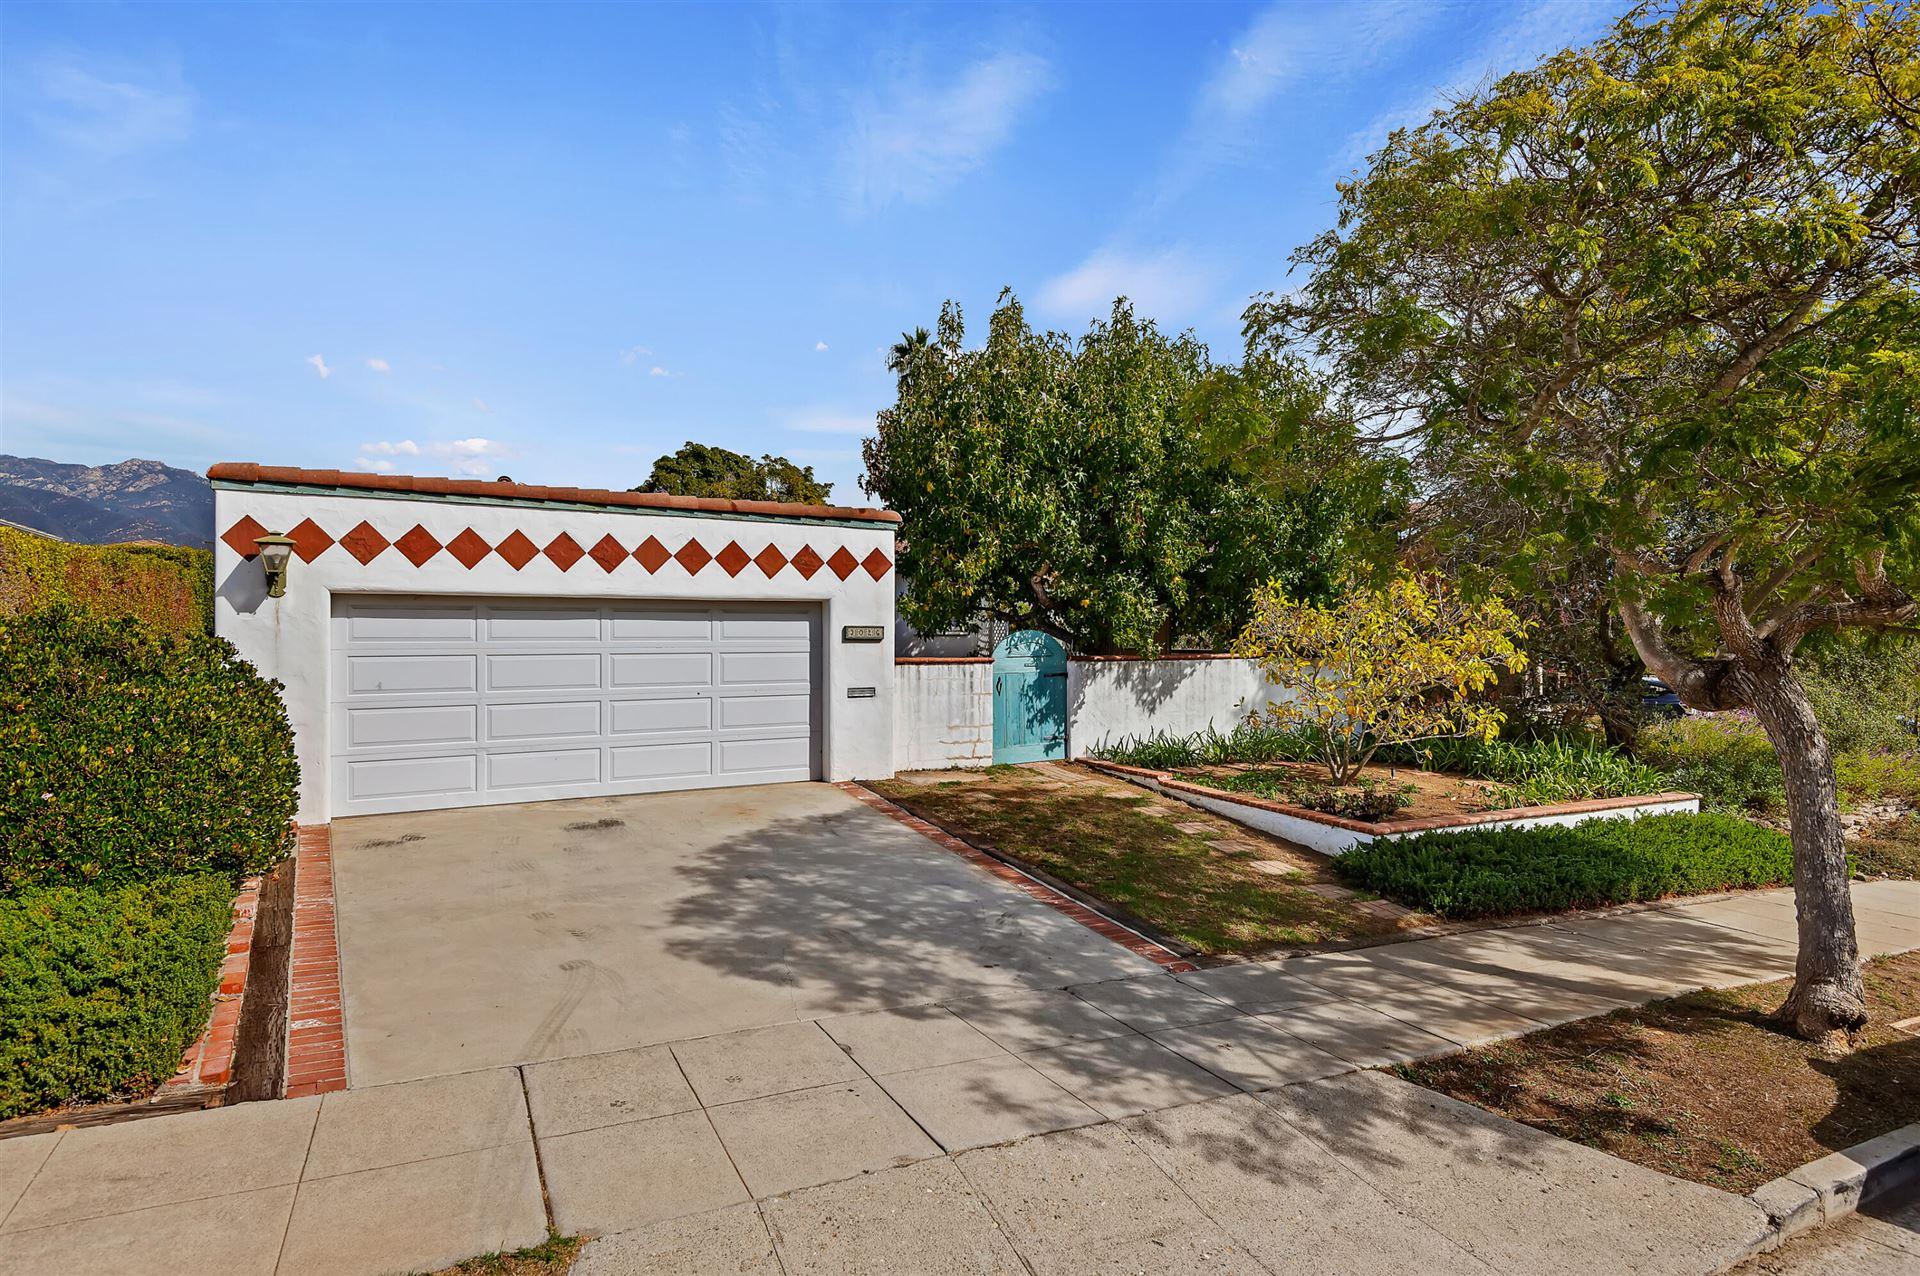 3026 Serena Rd, Santa Barbara, CA 93105 - MLS#: 21-3911